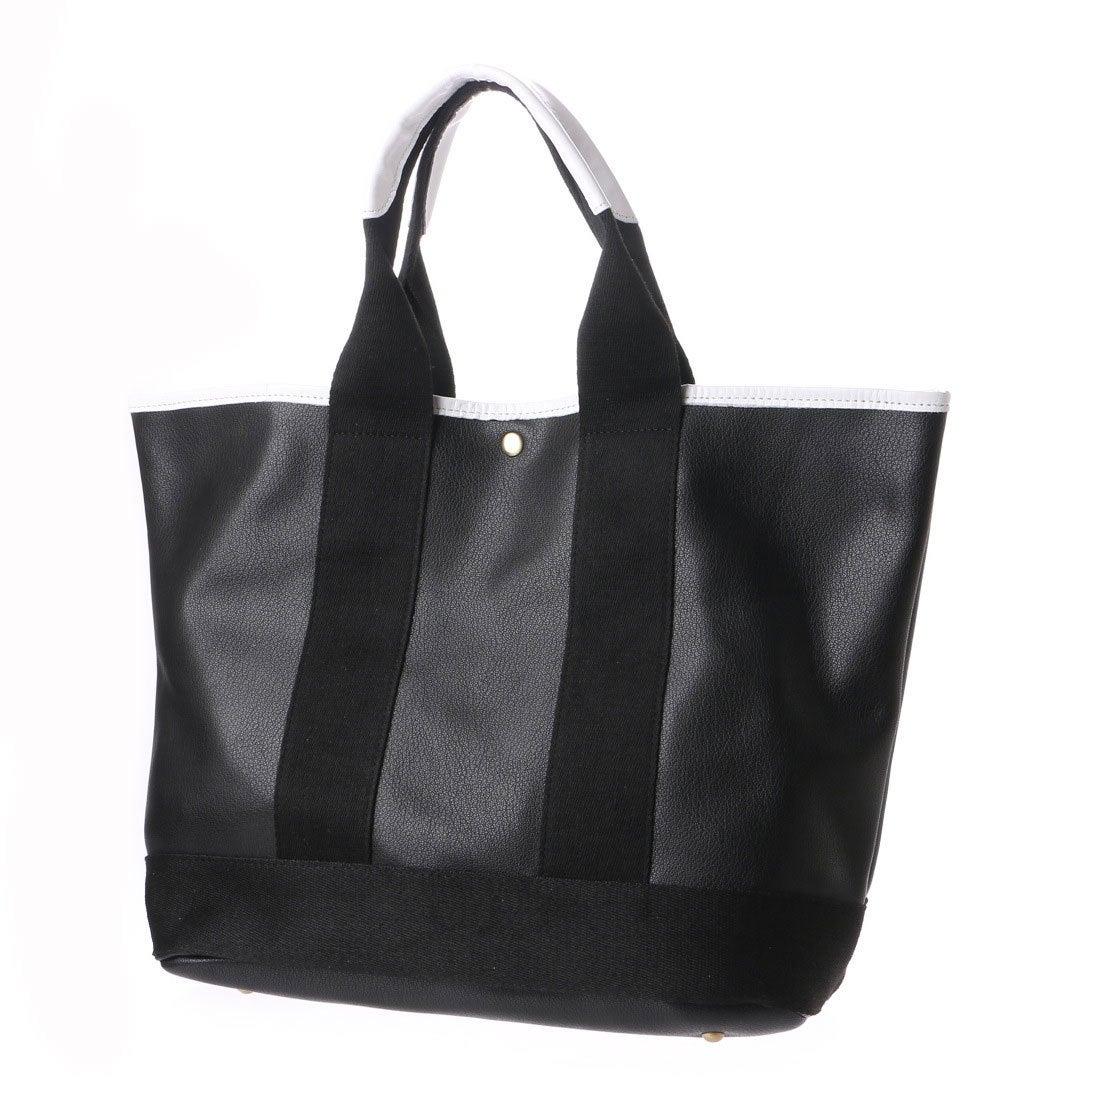 3da2feaa0e86 ペルケ perche スプリットレザートートバッグ (ブラック) -靴&ファッション通販 ロコンド〜自宅で試着、気軽に返品